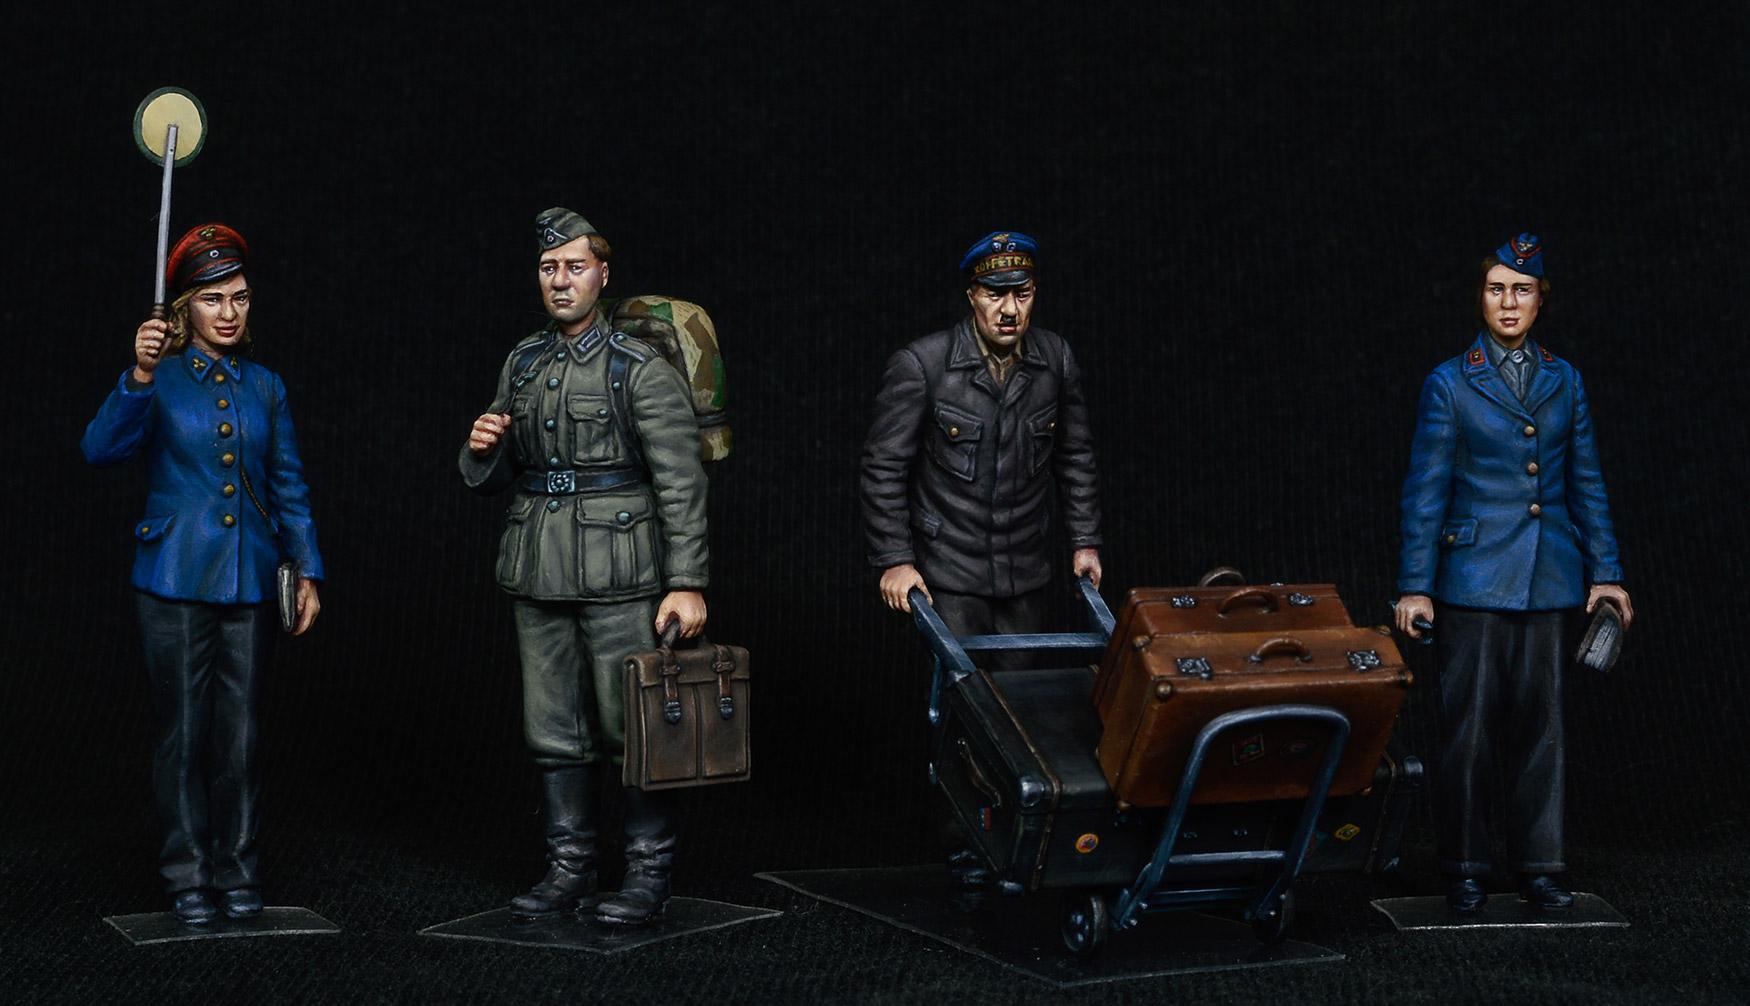 1/35 GERMAN TRAIN STATION STAFF 1930-40s 38010